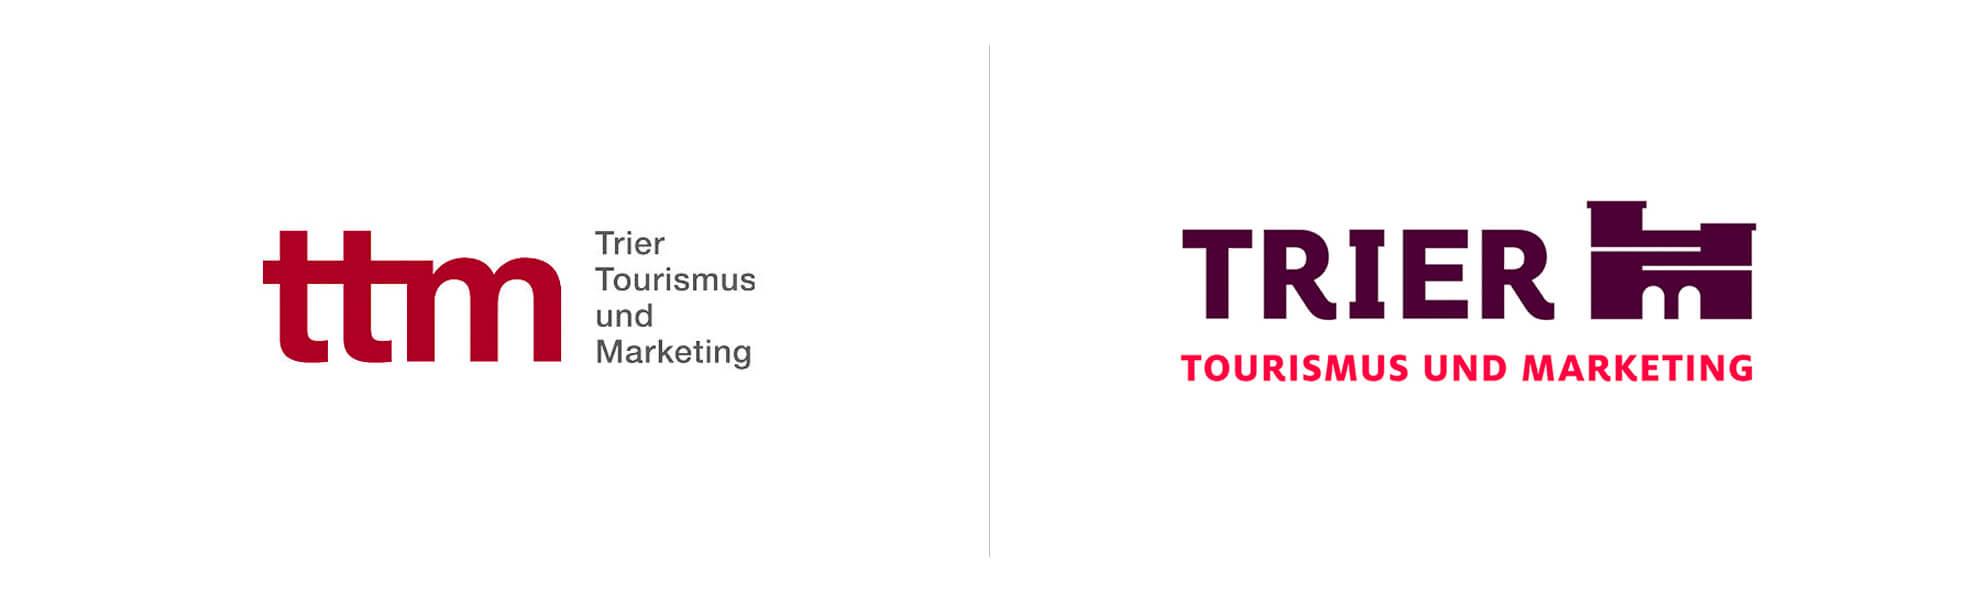 Drugi wariant logo Trieru